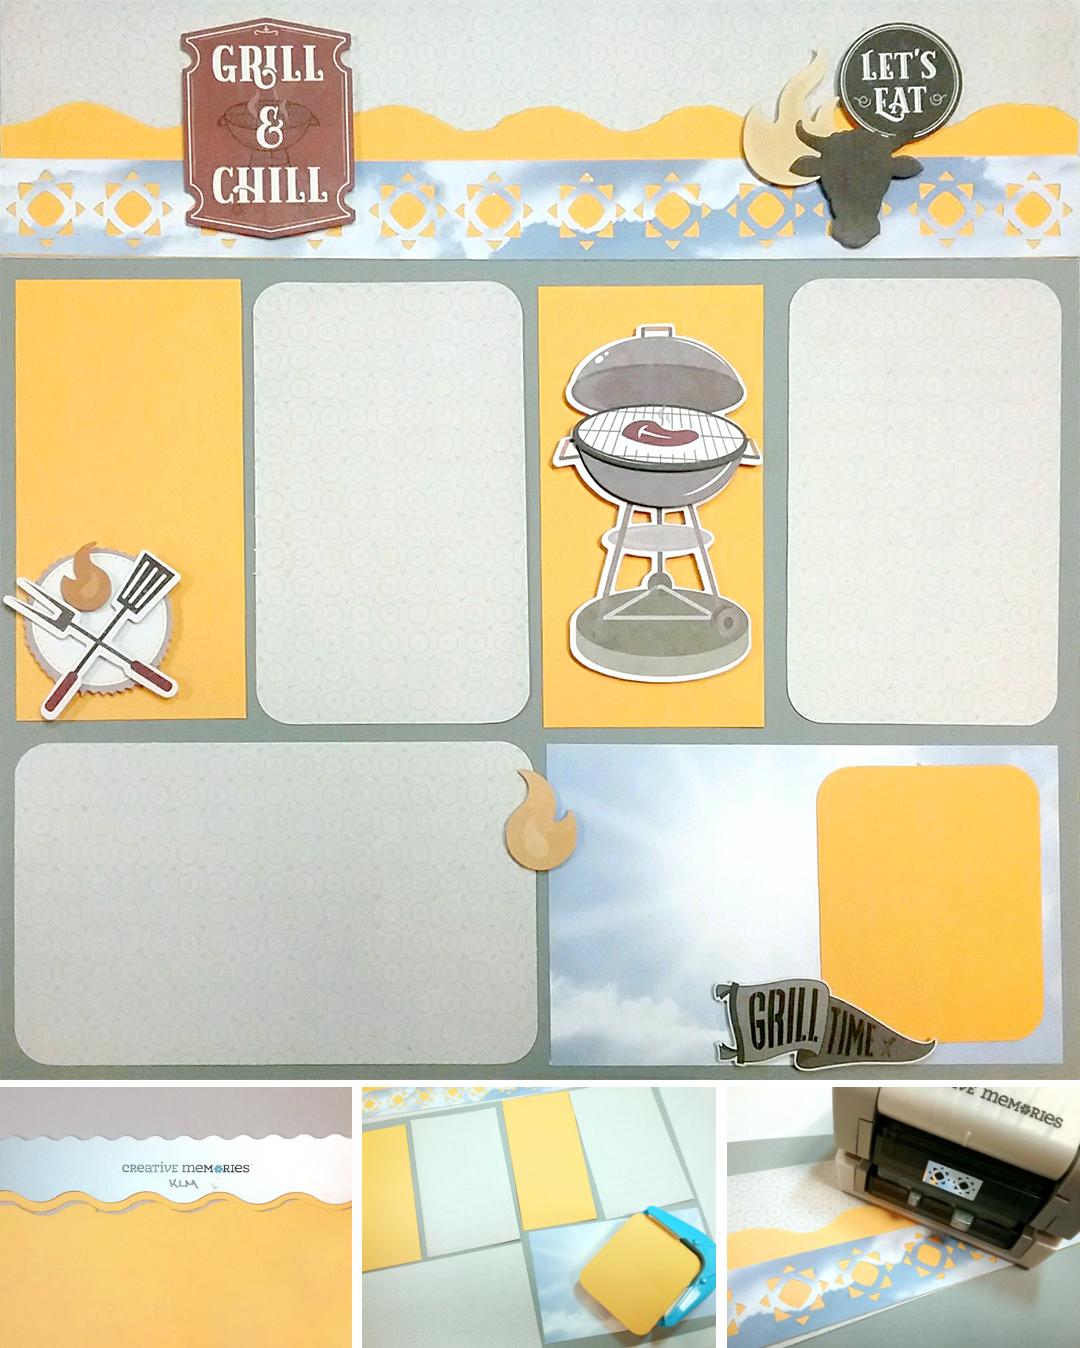 Virtual-Crop-Challenge5-Fanatic-Creative-Memories.jpg